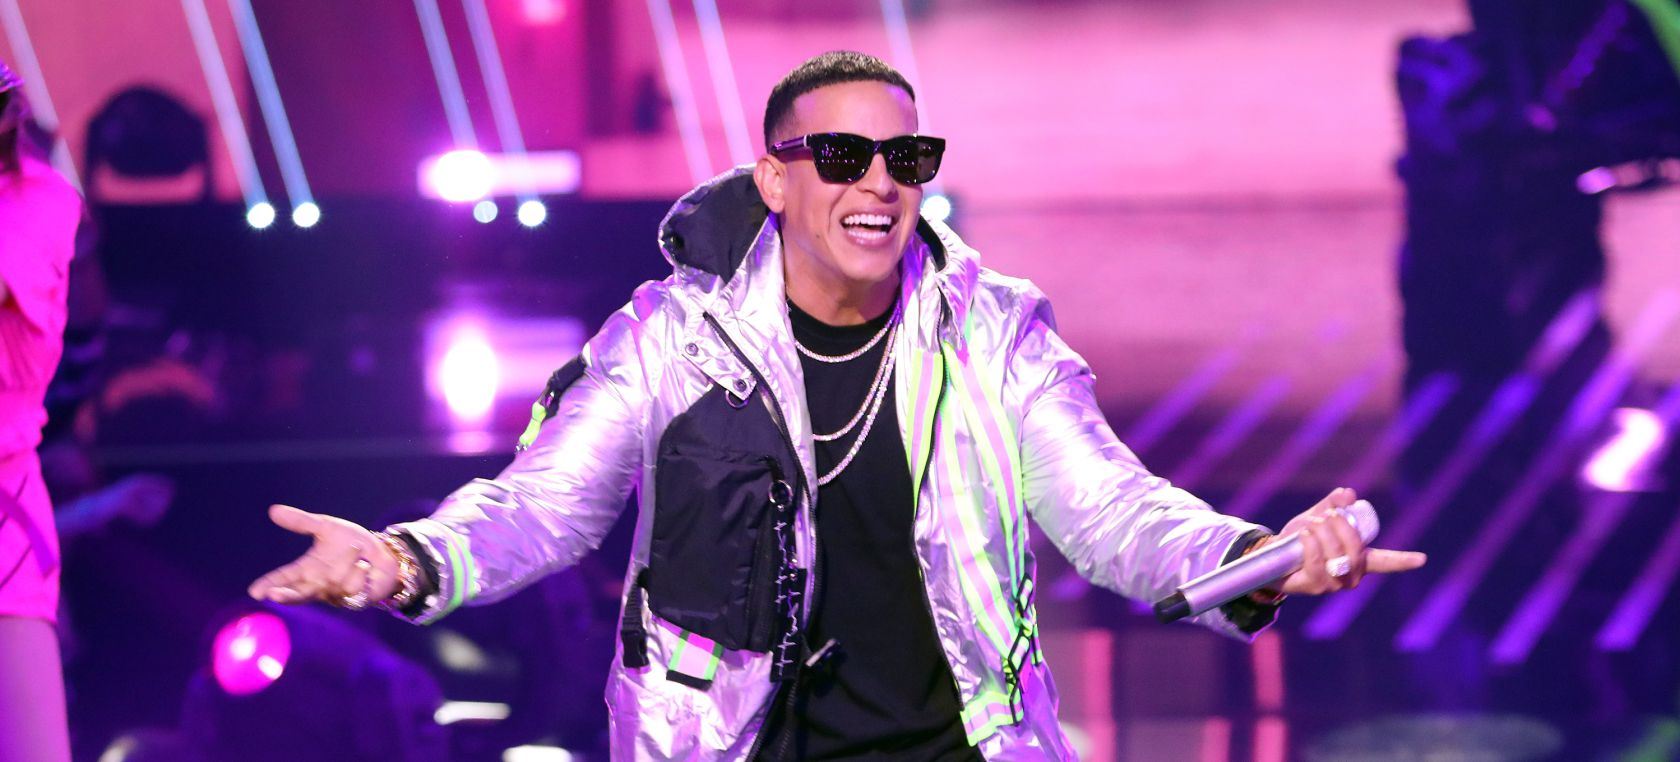 Día mundial de reggaetón